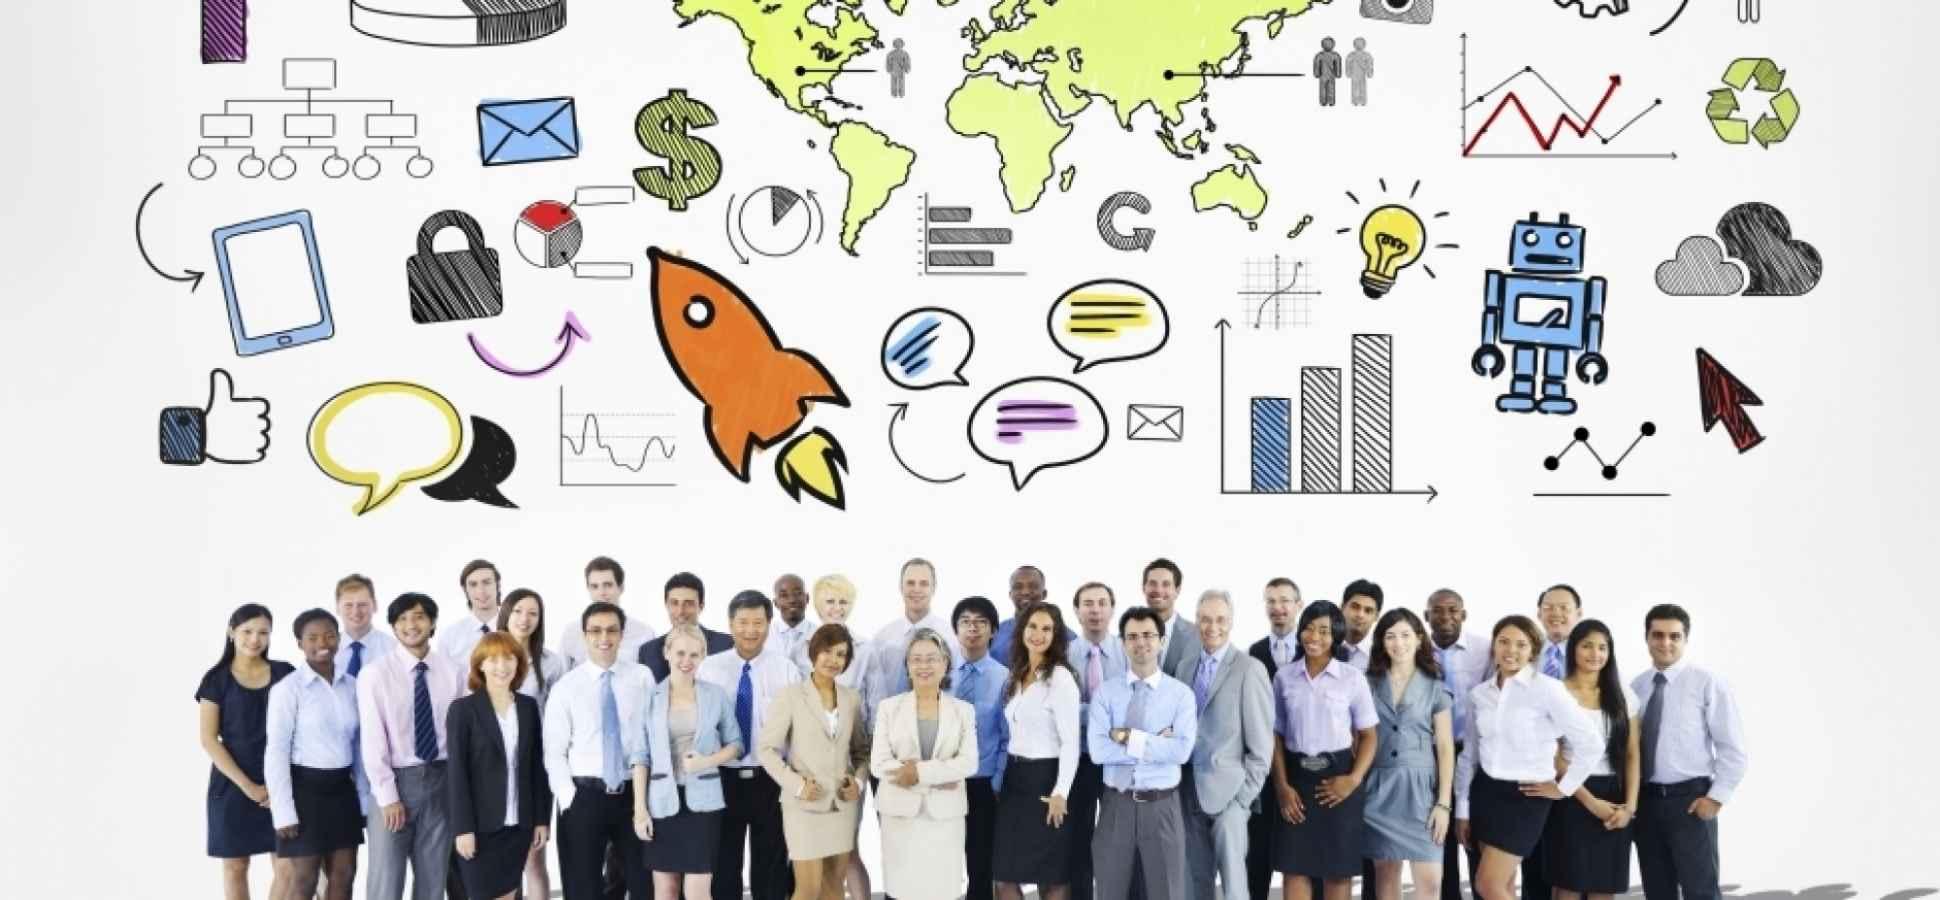 5 Ways to Grow Your Business Through Social Media